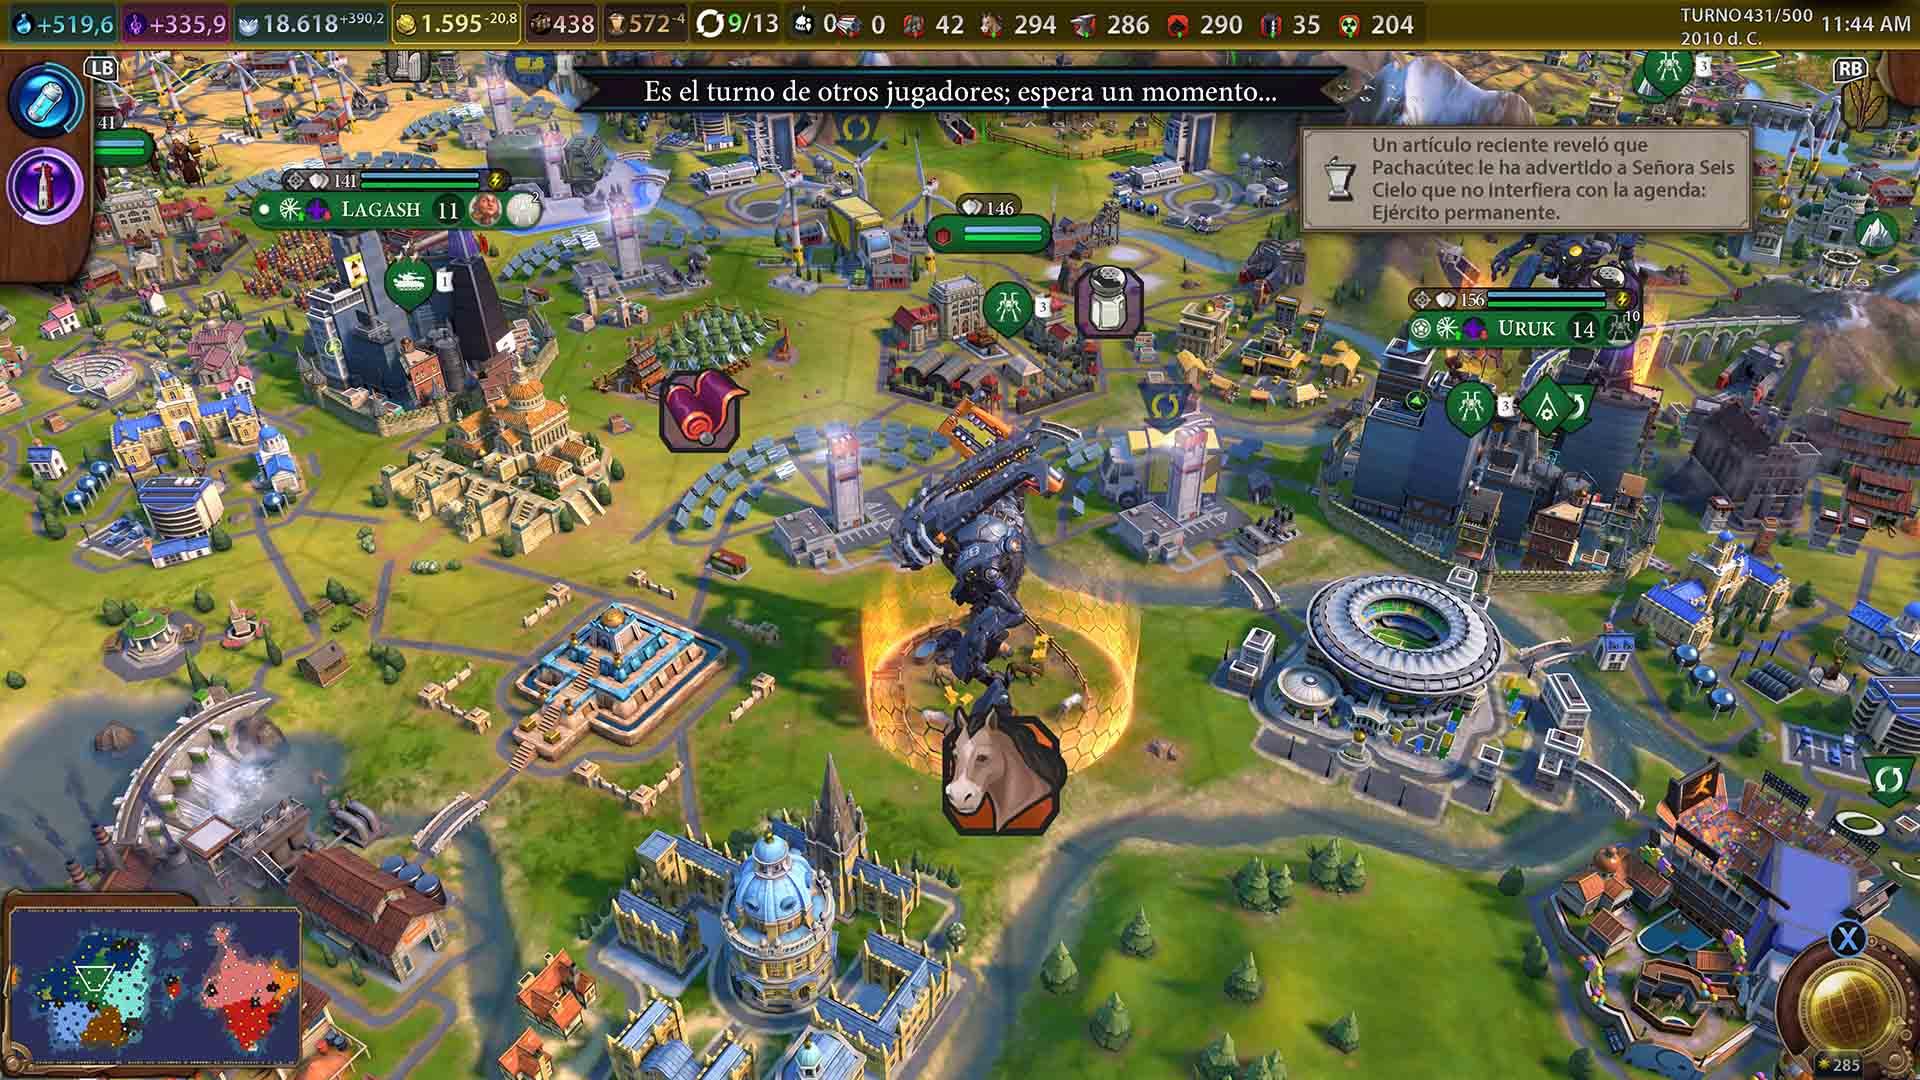 Análisis de Civilization VI - Pase New Frontier - Xbox One 10